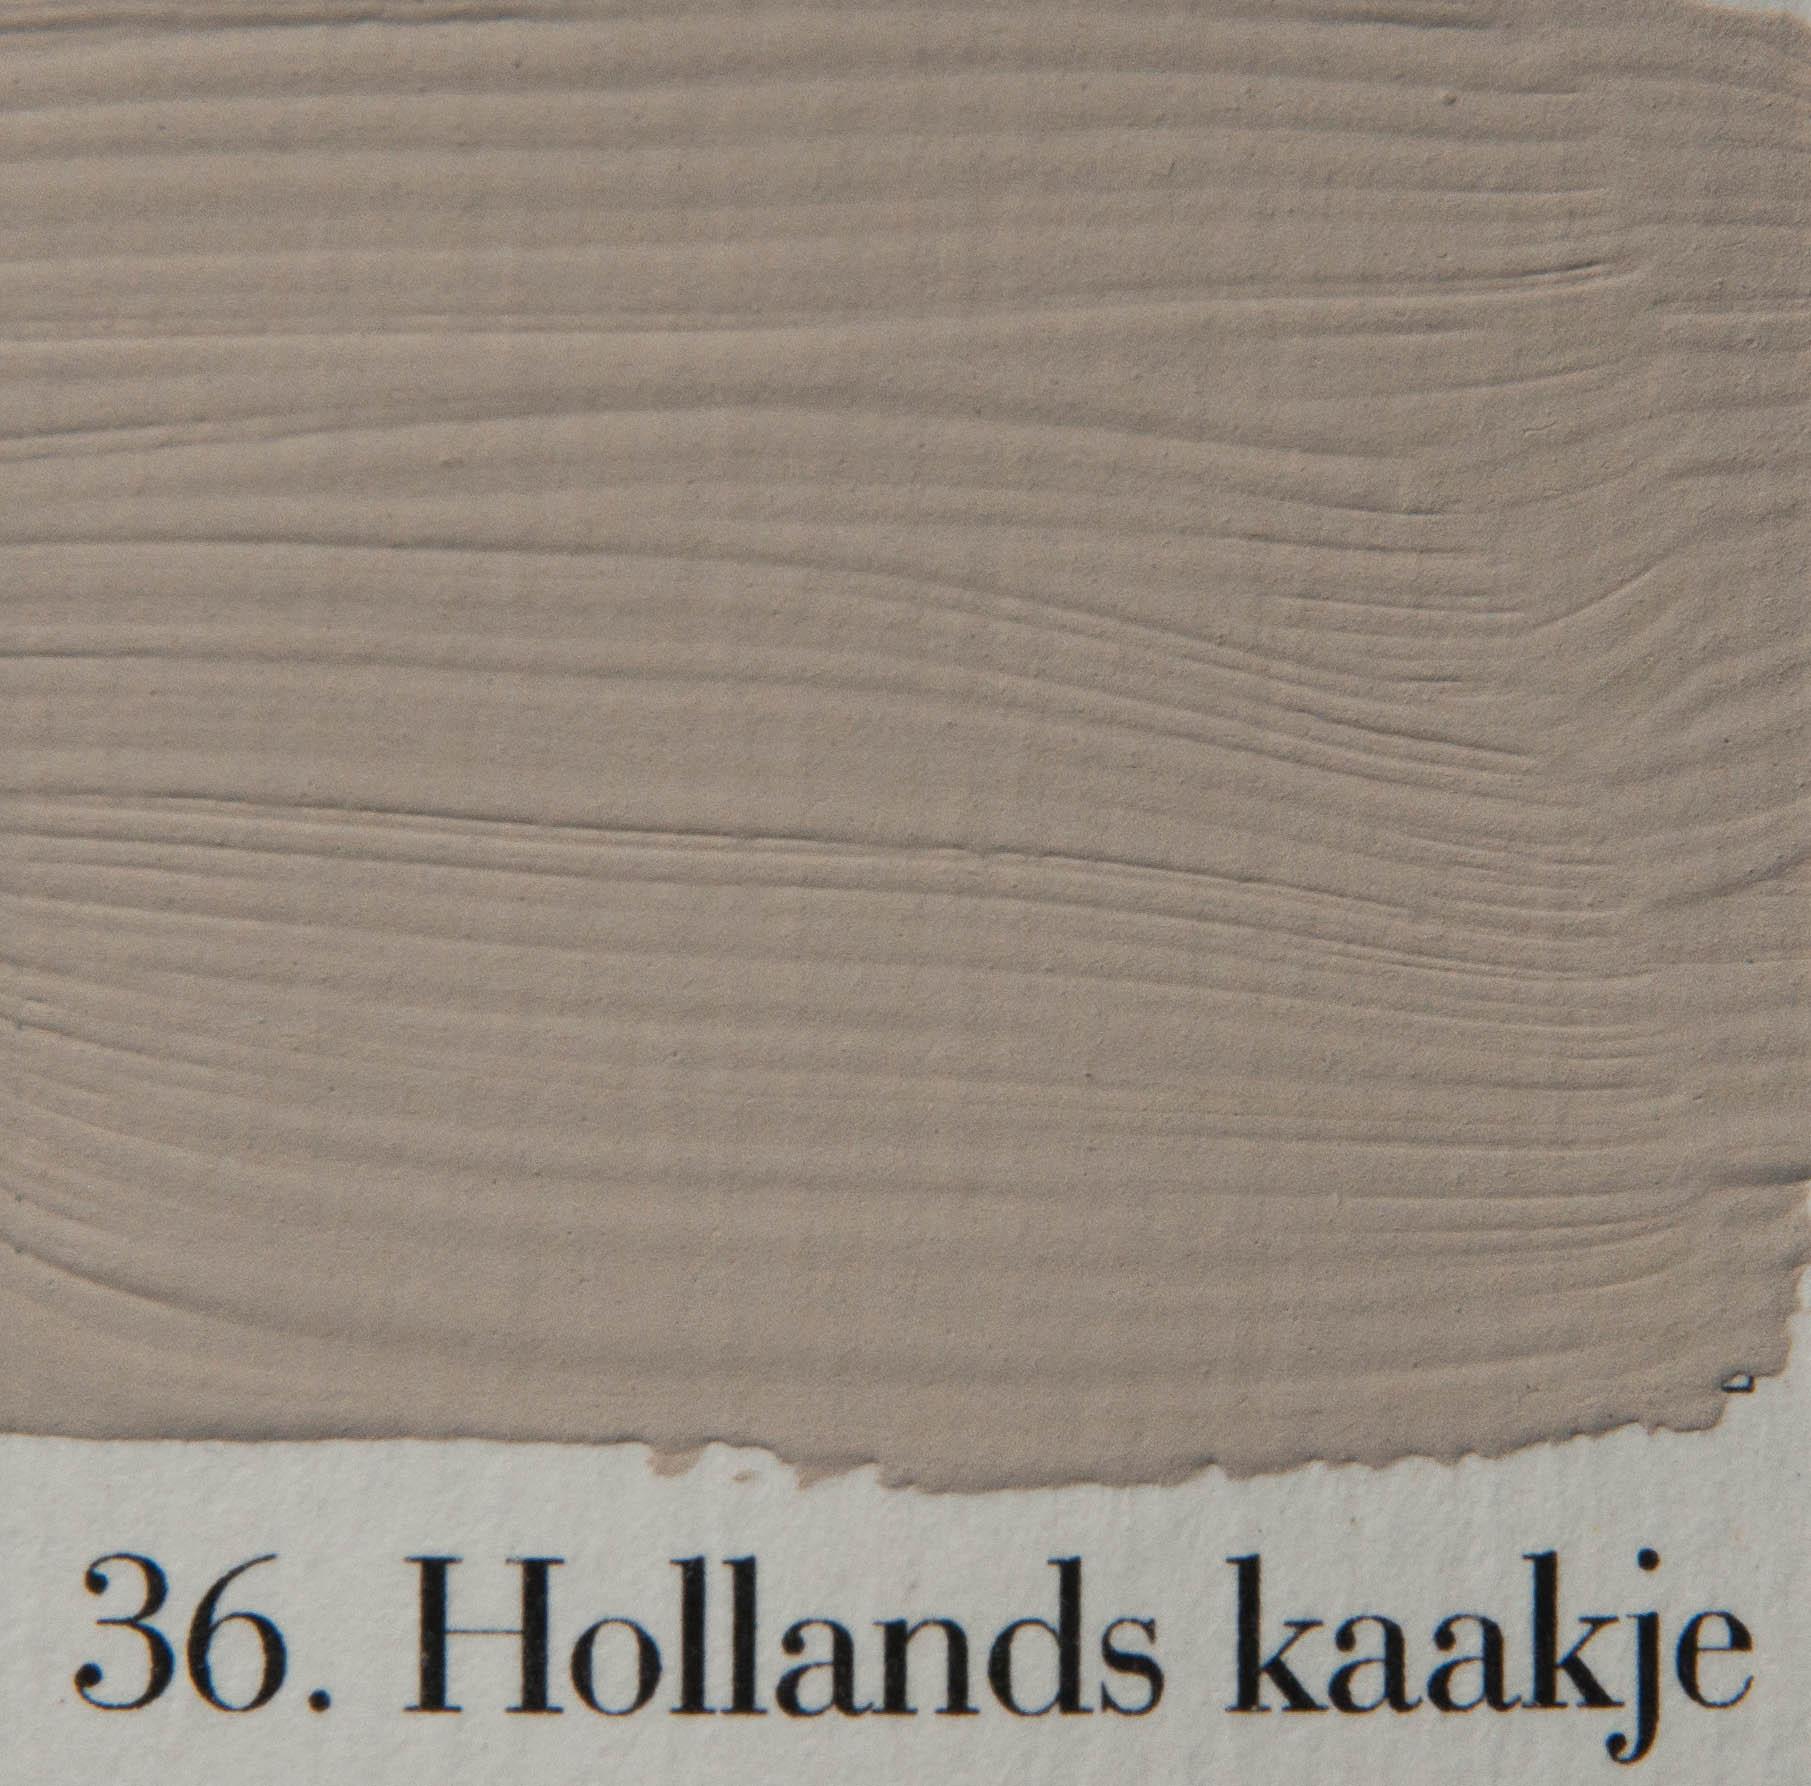 'l Authentique krijtverf 36. Hollands kaakje